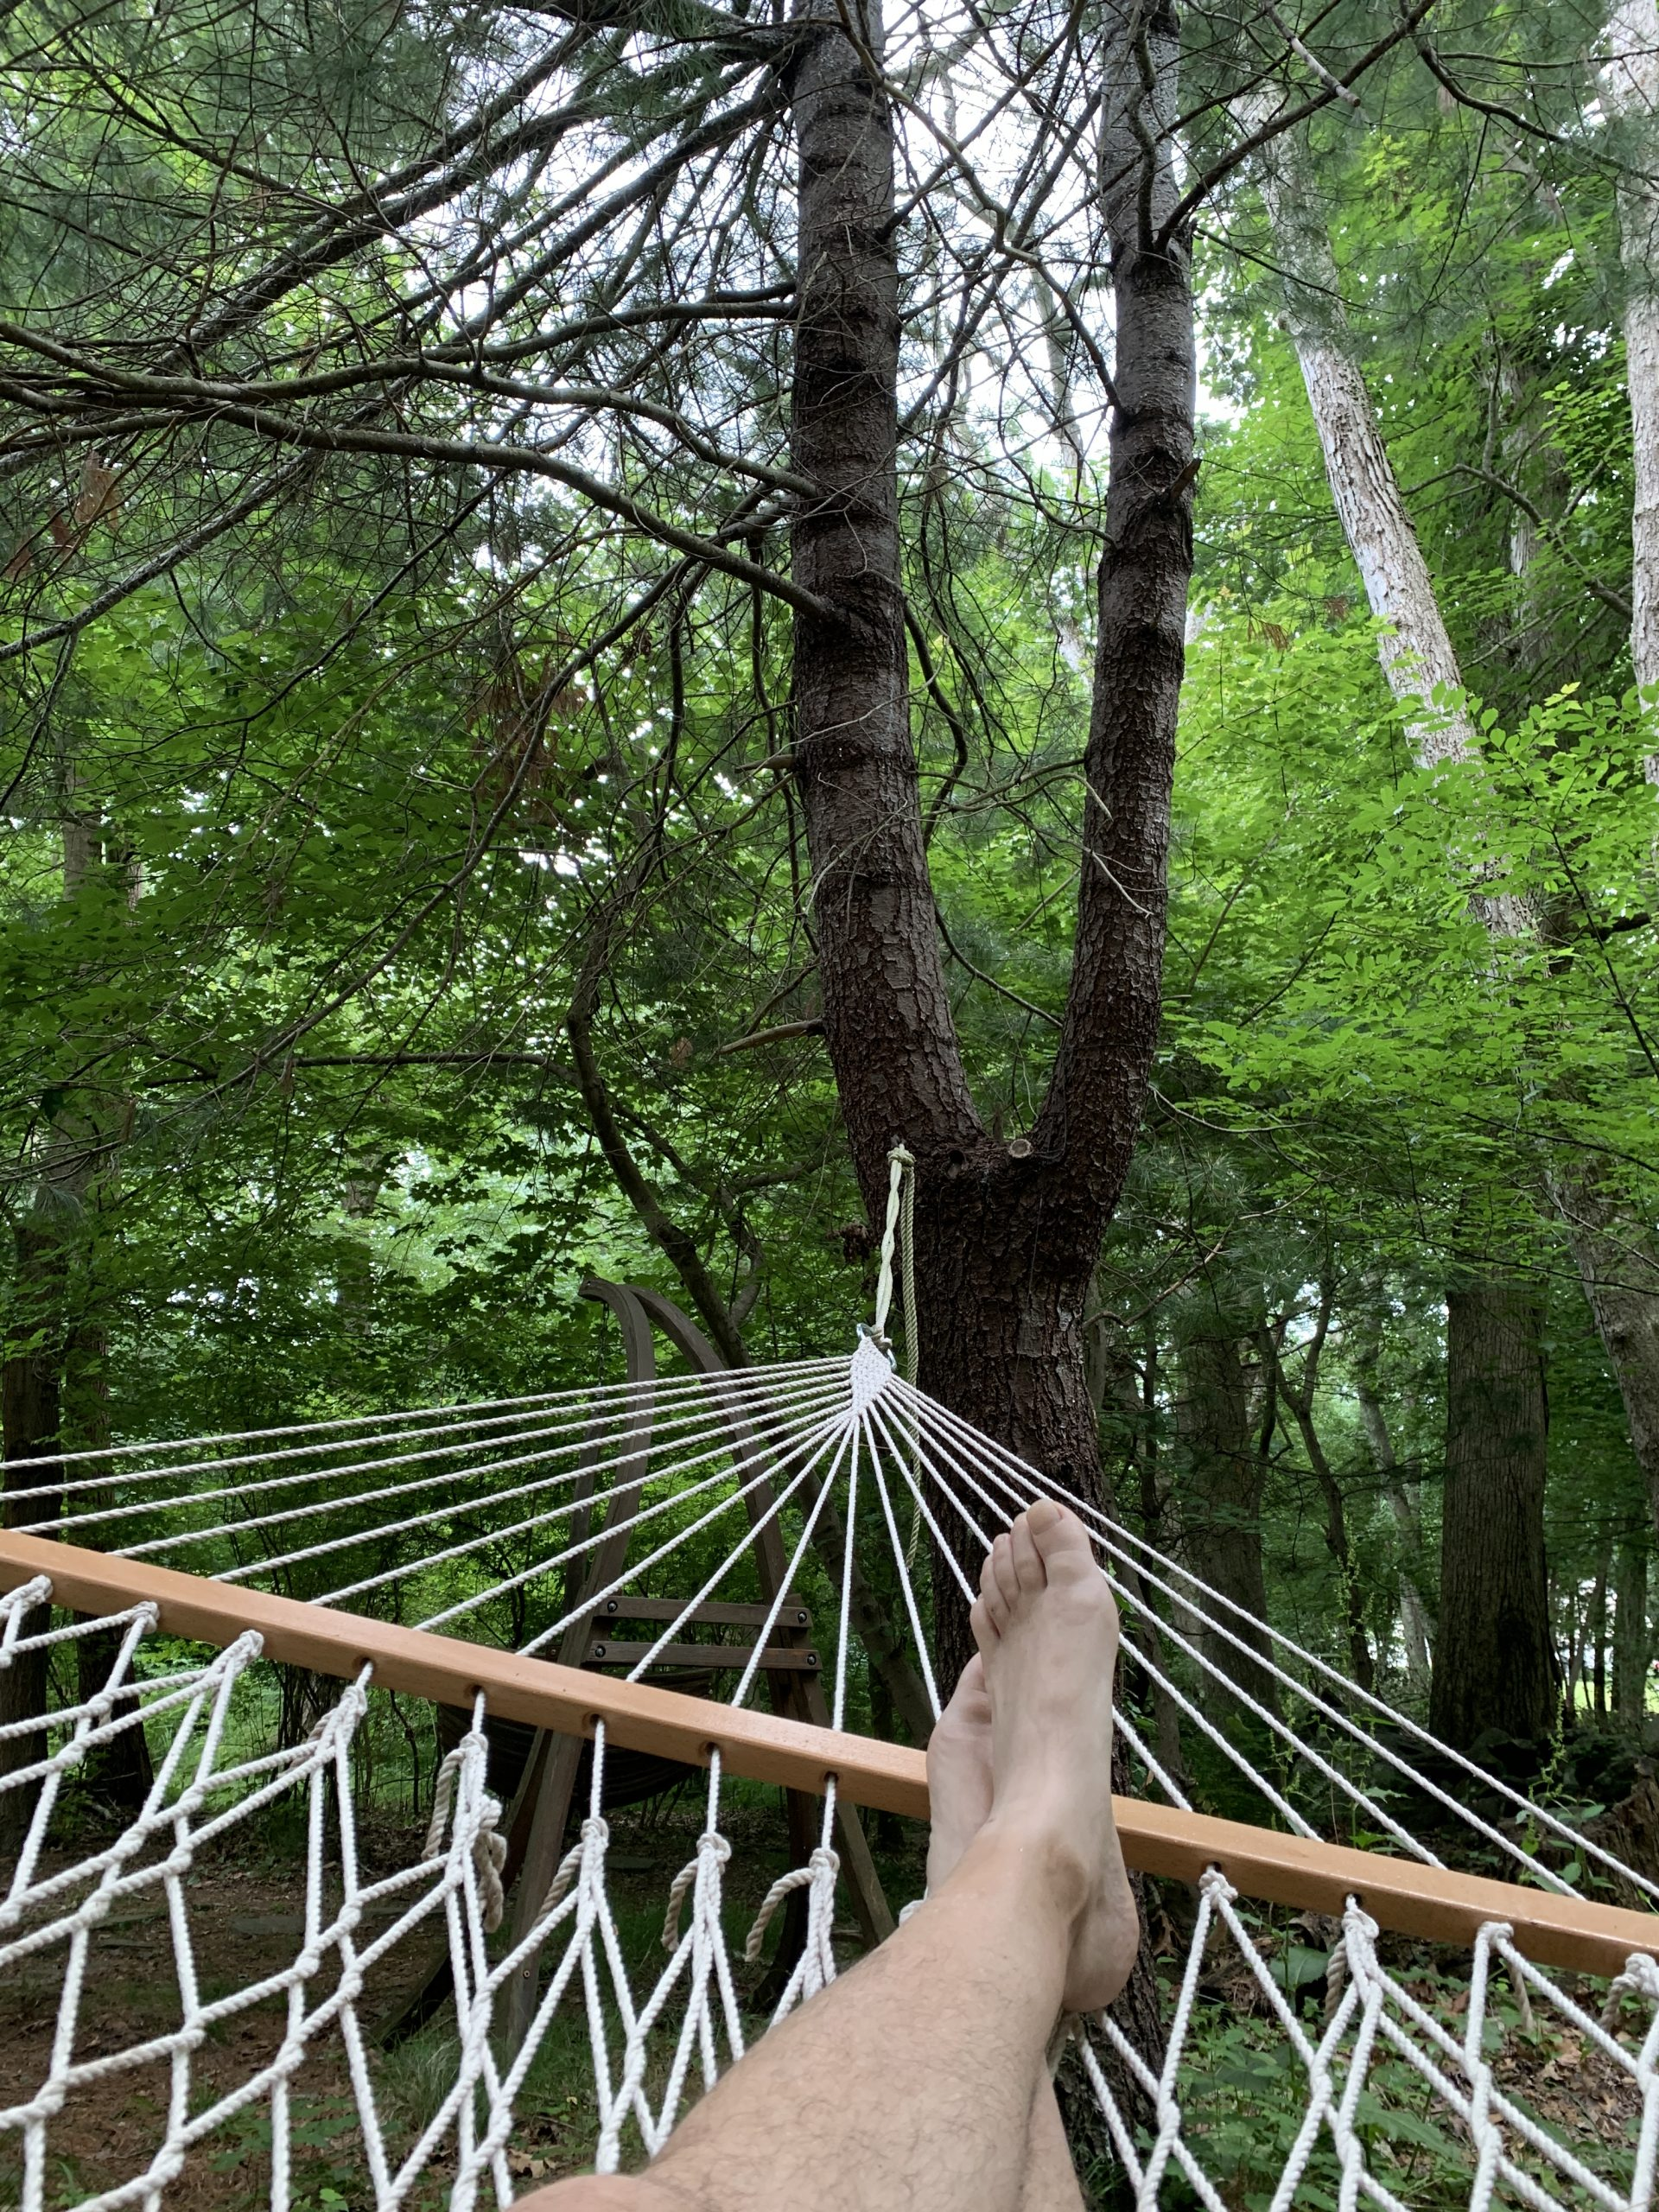 Hangin' in the Hammock